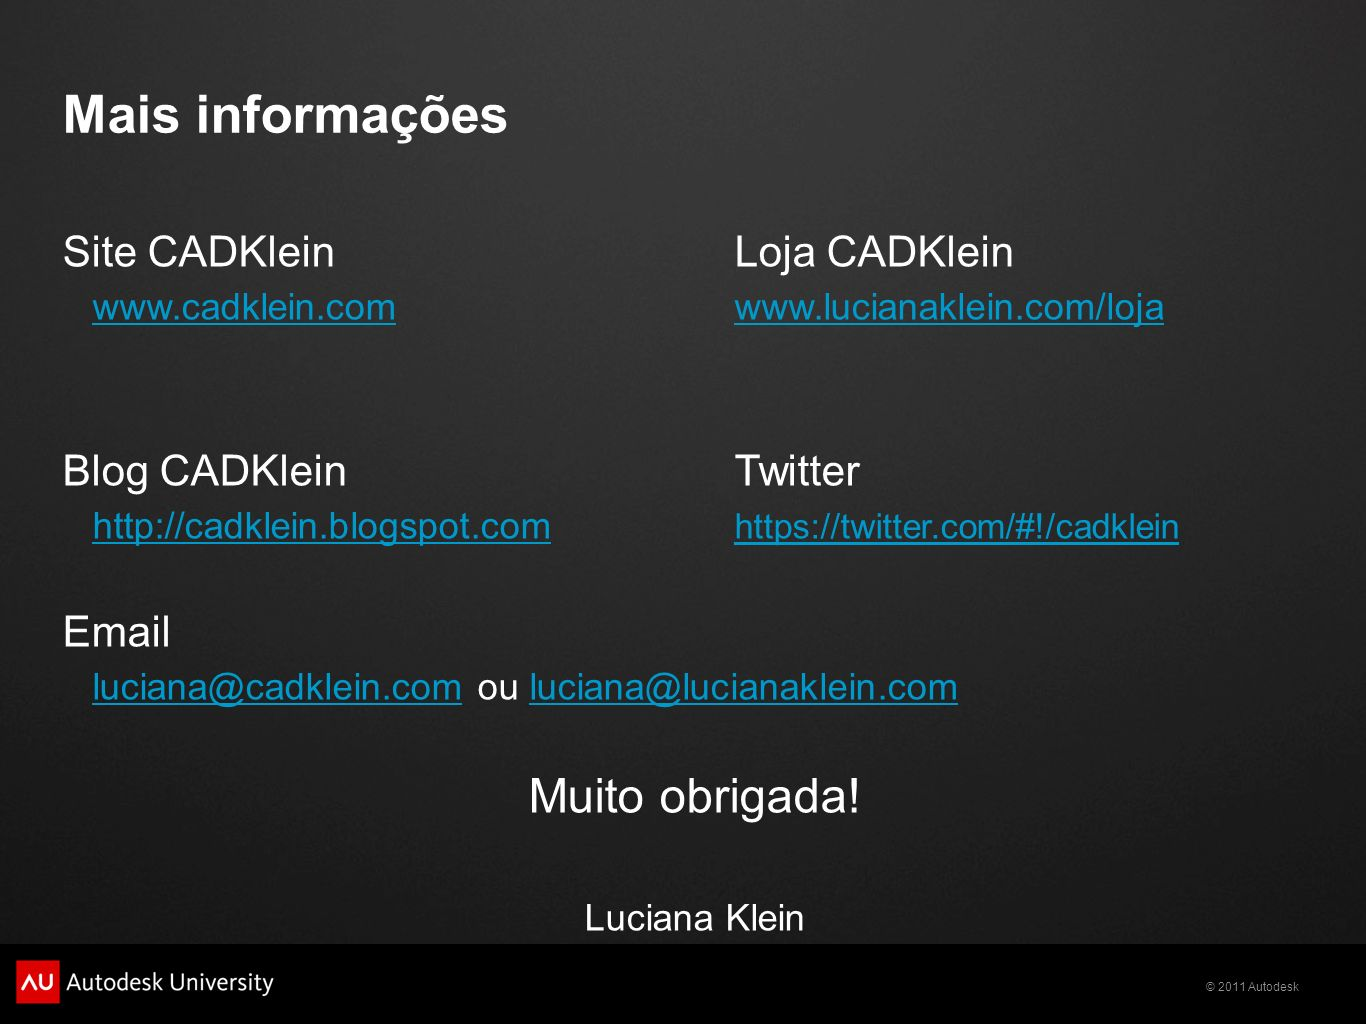 © 2011 Autodesk Mais informações Site CADKleinLoja CADKlein www.cadklein.comwww.cadklein.com www.lucianaklein.com/lojawww.lucianaklein.com/loja Blog C